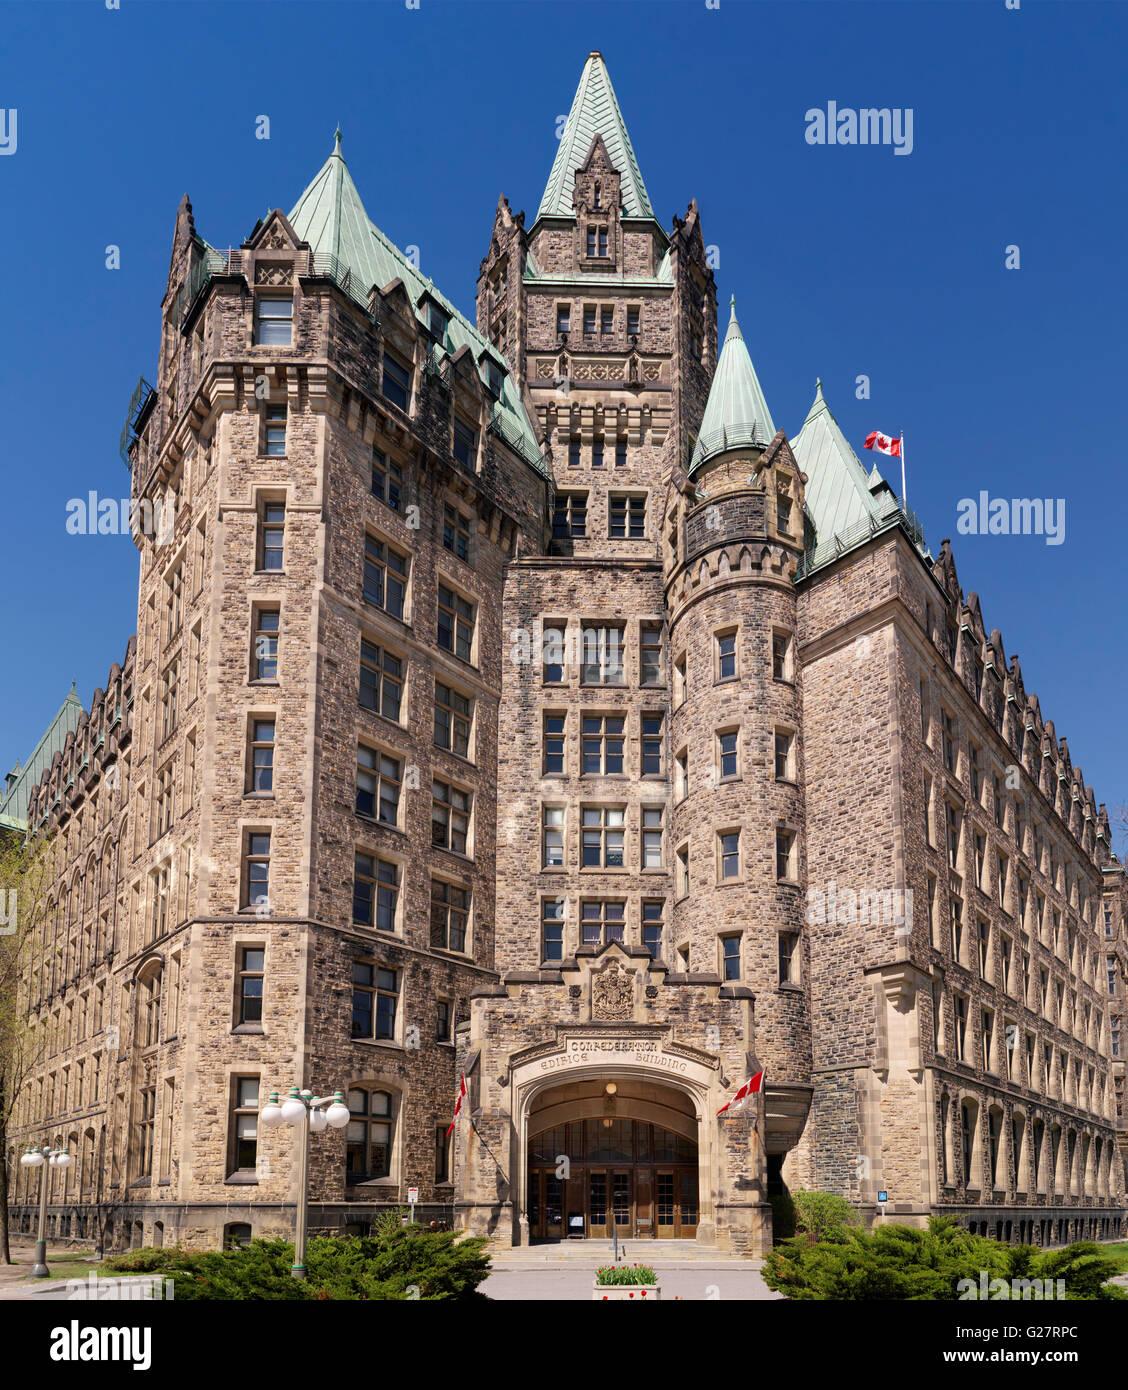 Confederation Edifice building in downtown Ottawa, Ontario, Canada - Stock Image